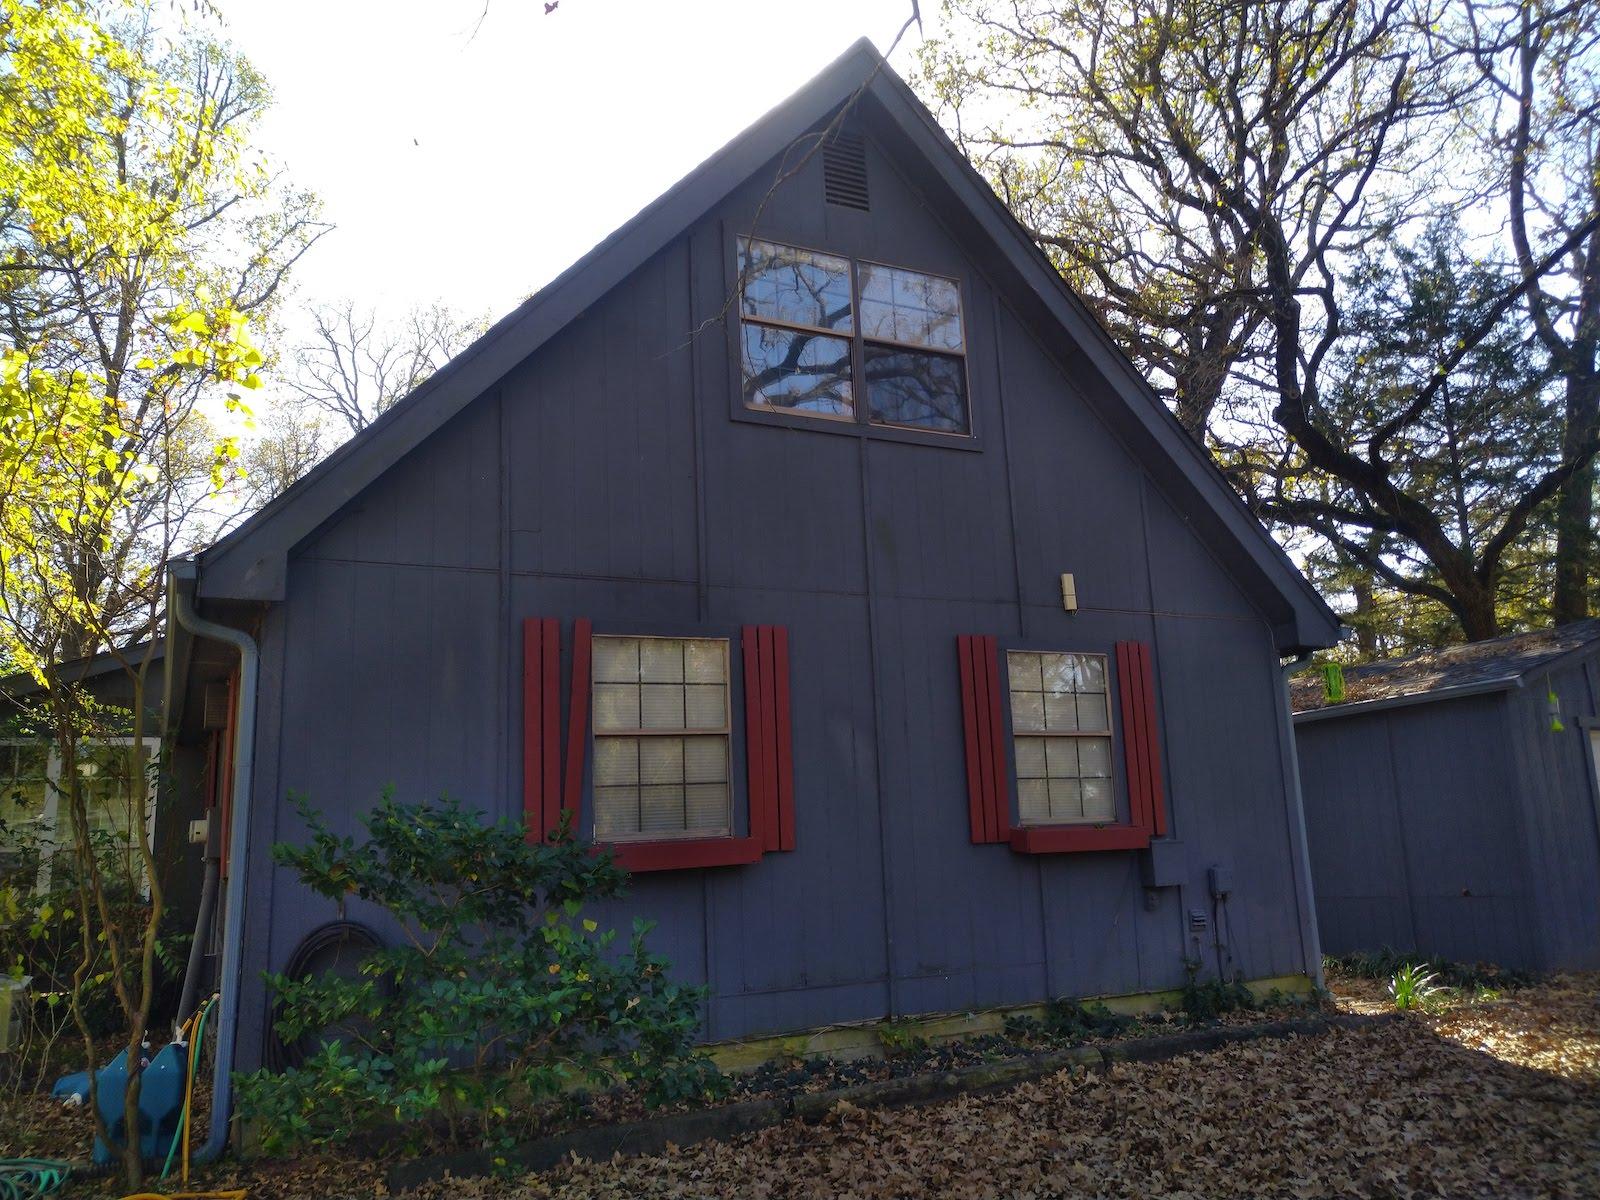 Wood siding on 1 story house before restoration